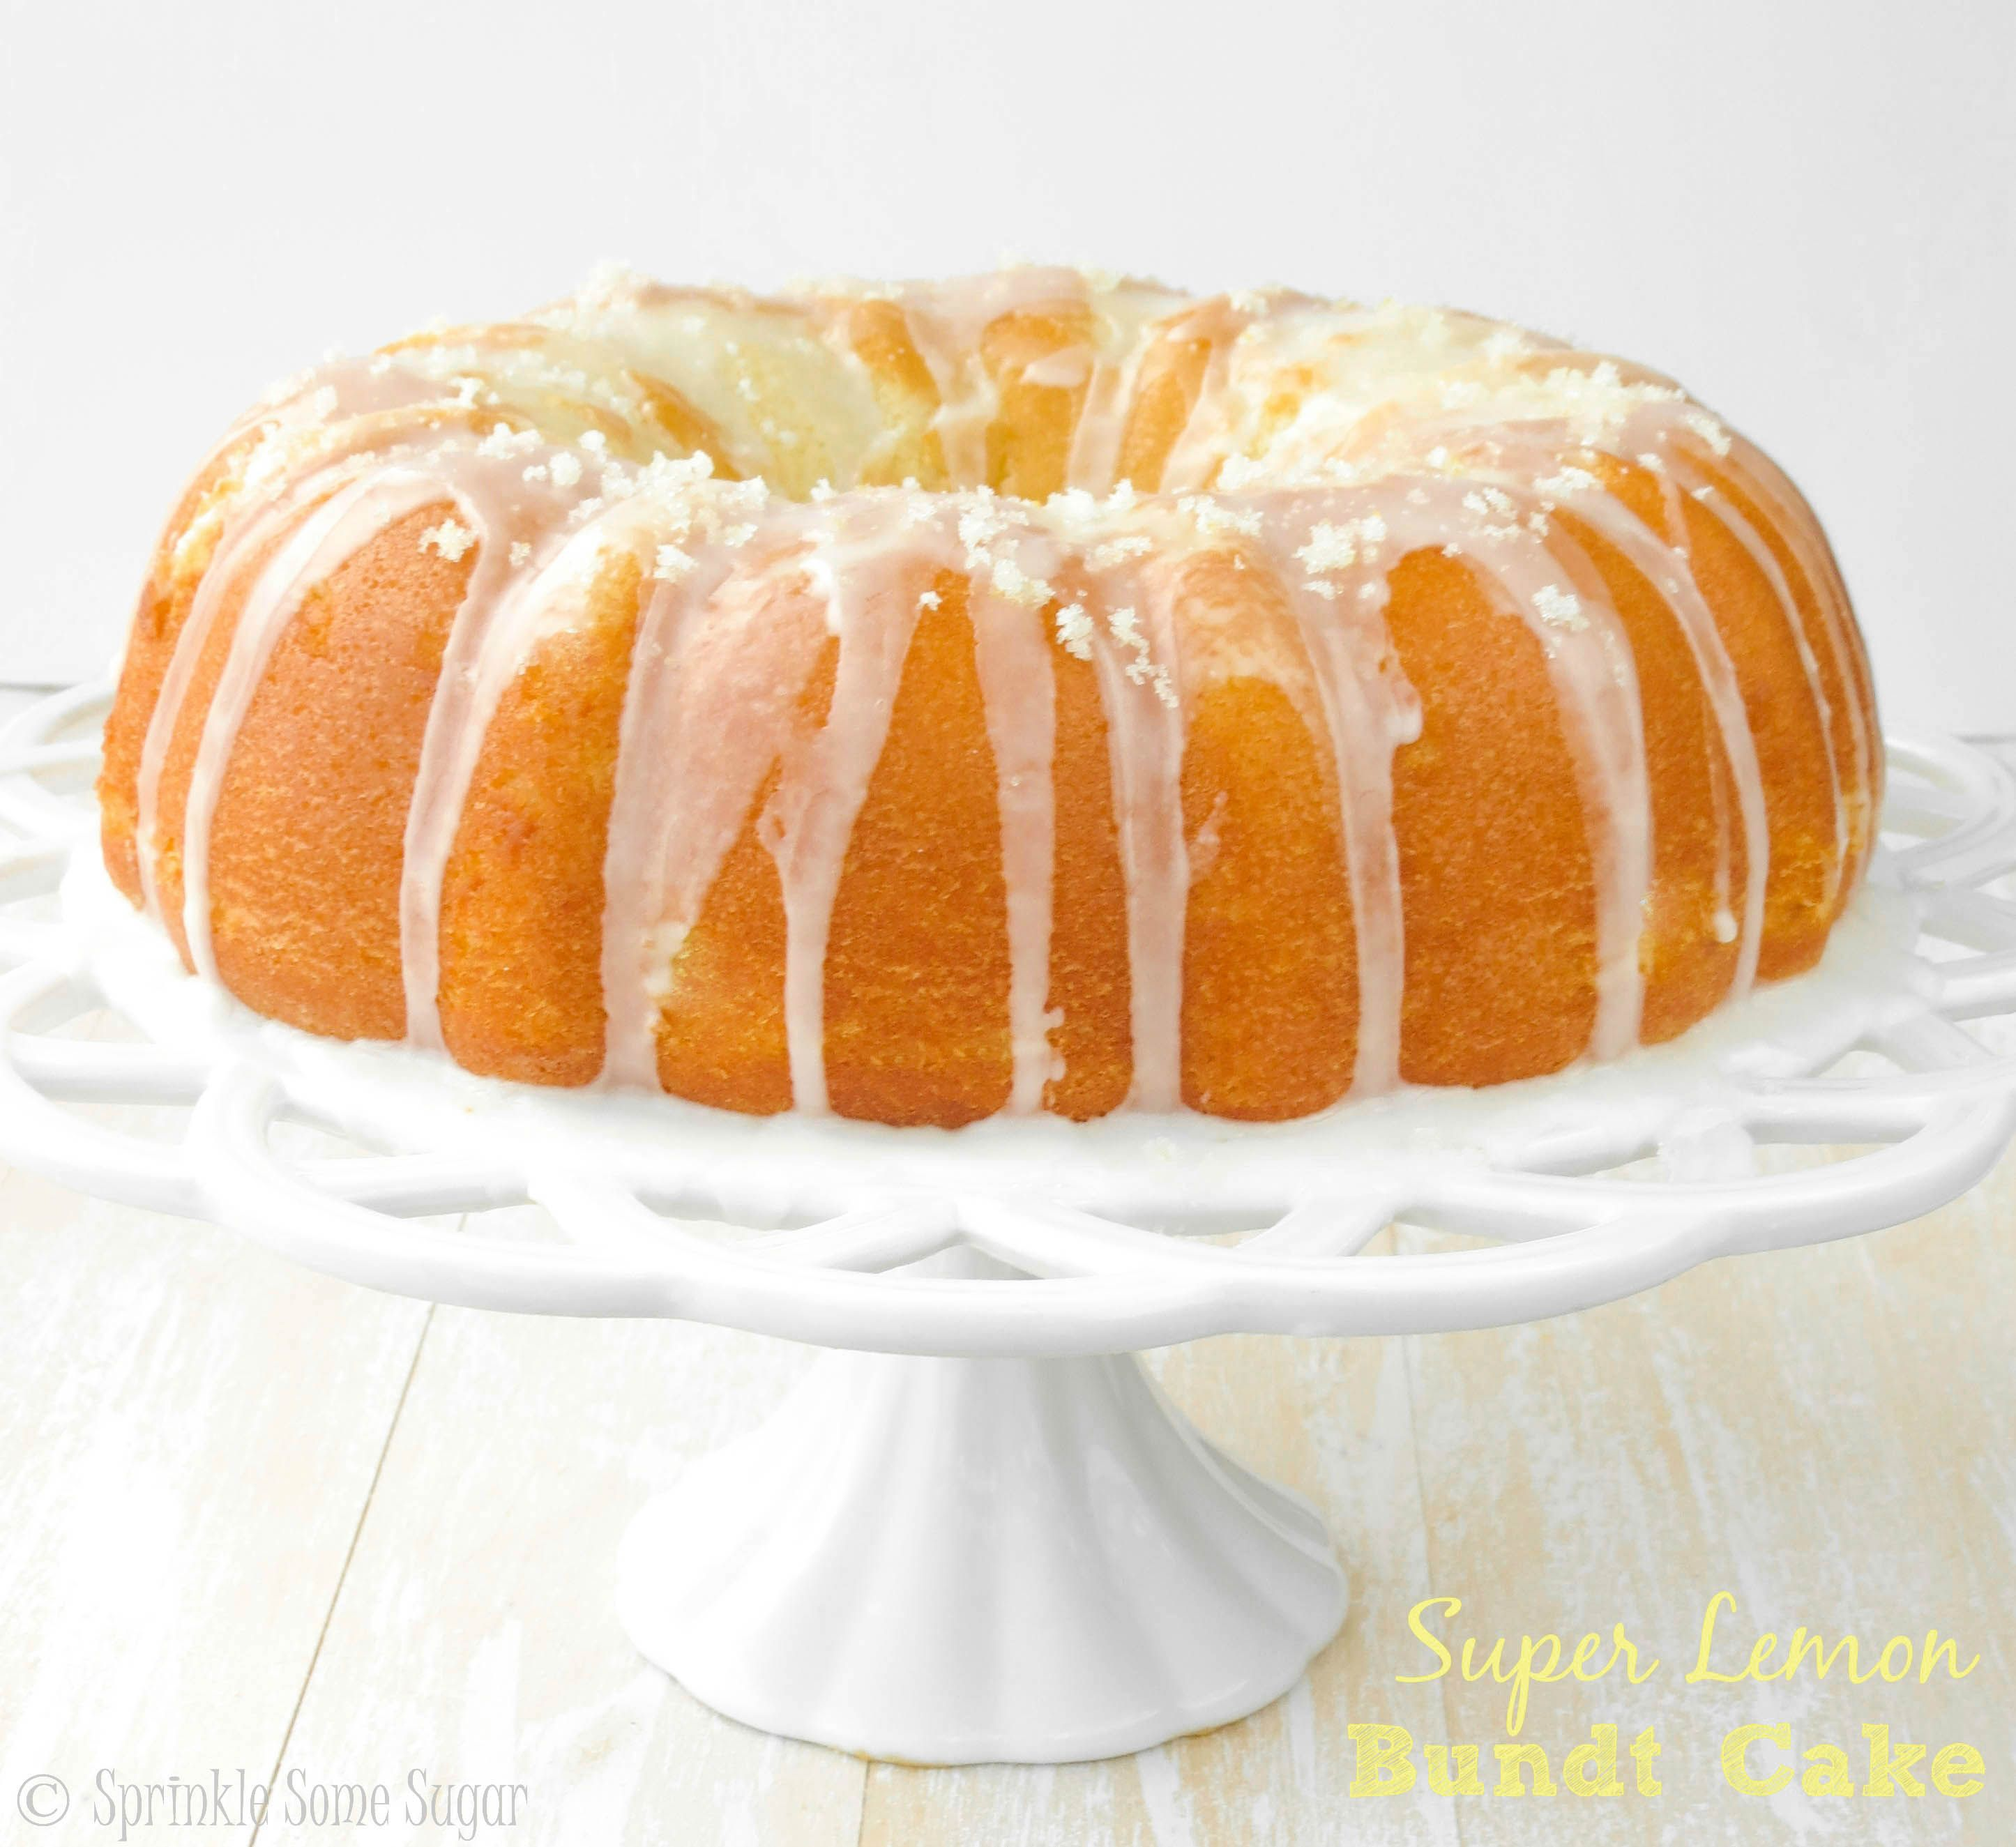 Super Lemon Bundt Cake Recipe Desserts Cake Recipes